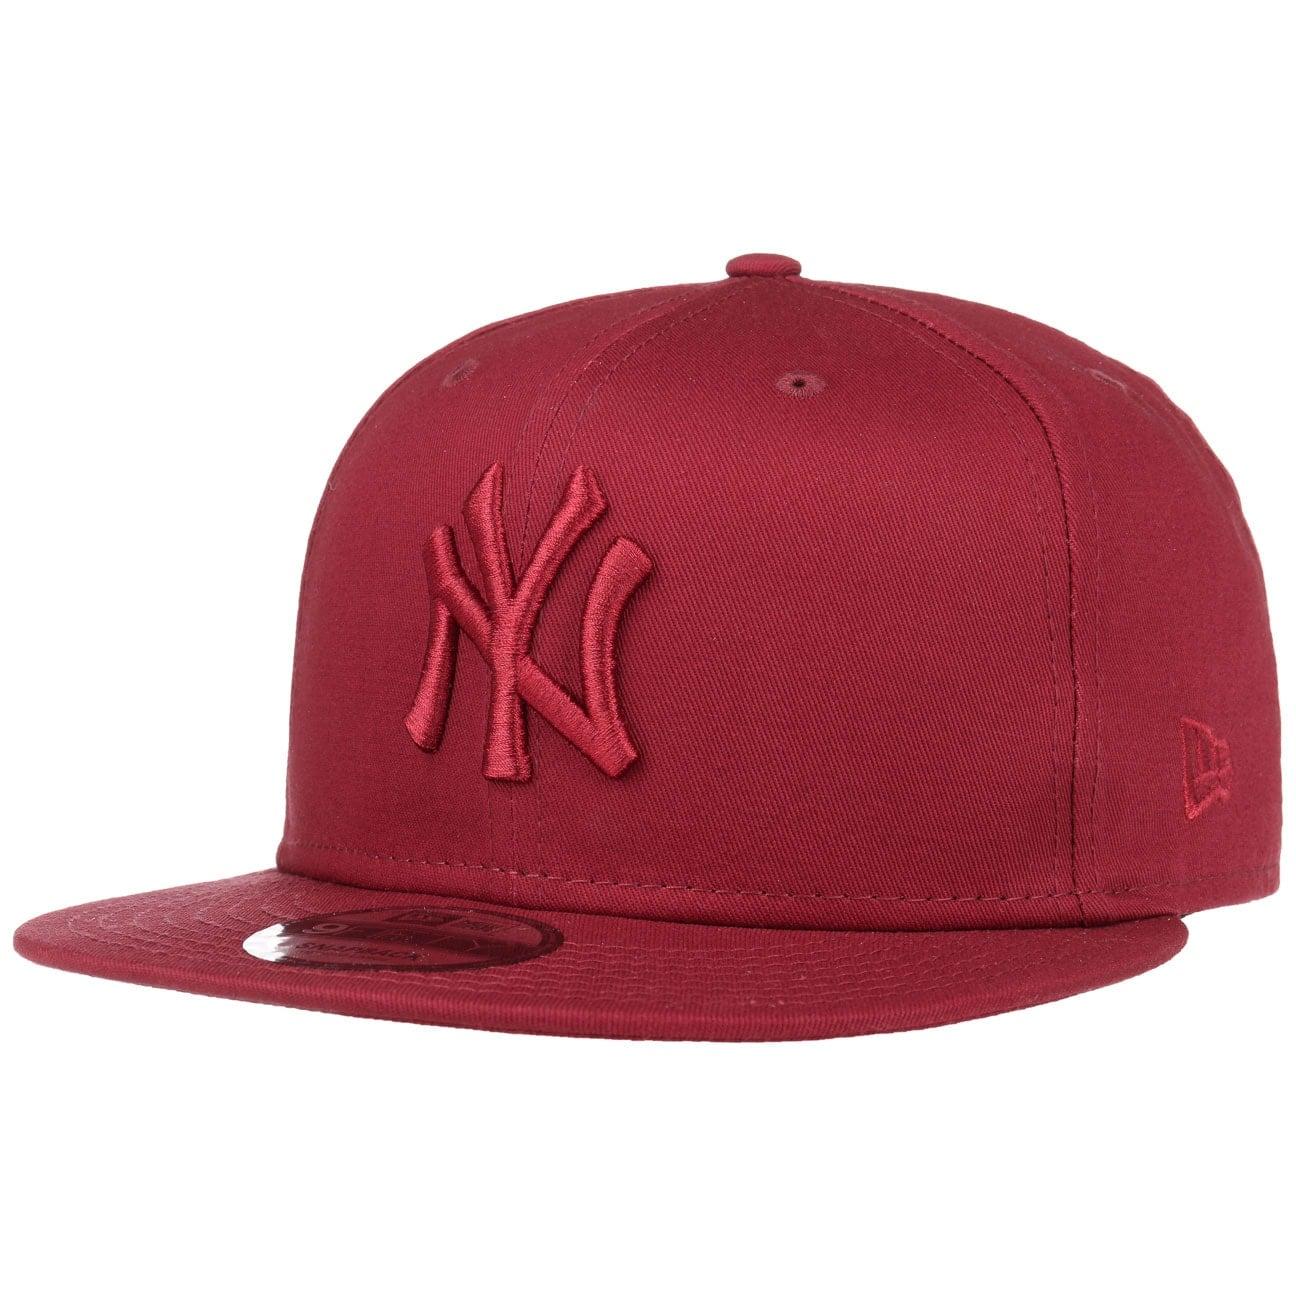 9fifty-uni-league-ess-yankees-cap-by-new-era-basecap